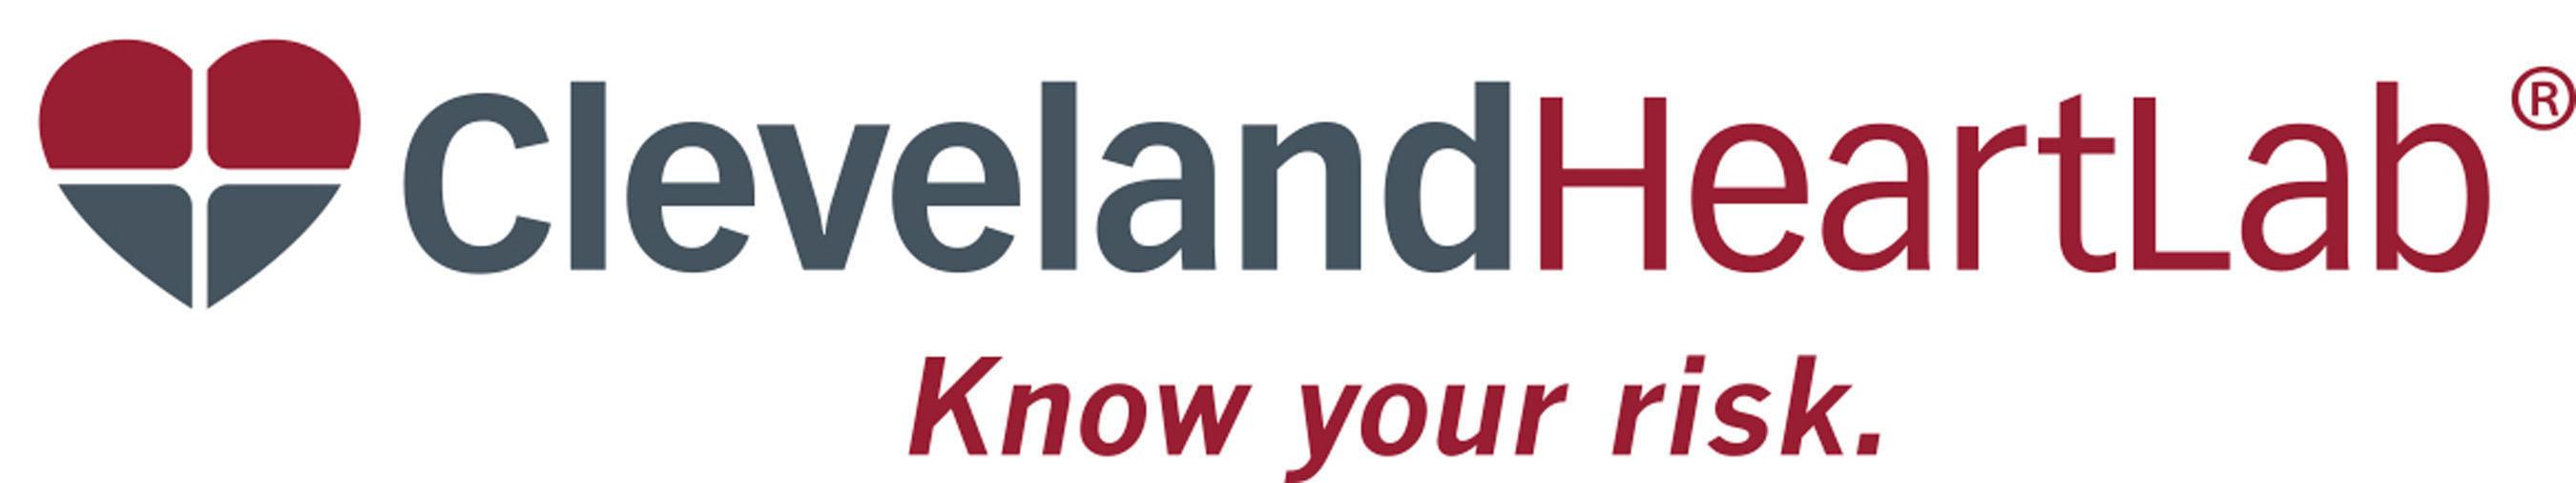 http://www.clevelandheartlab.com